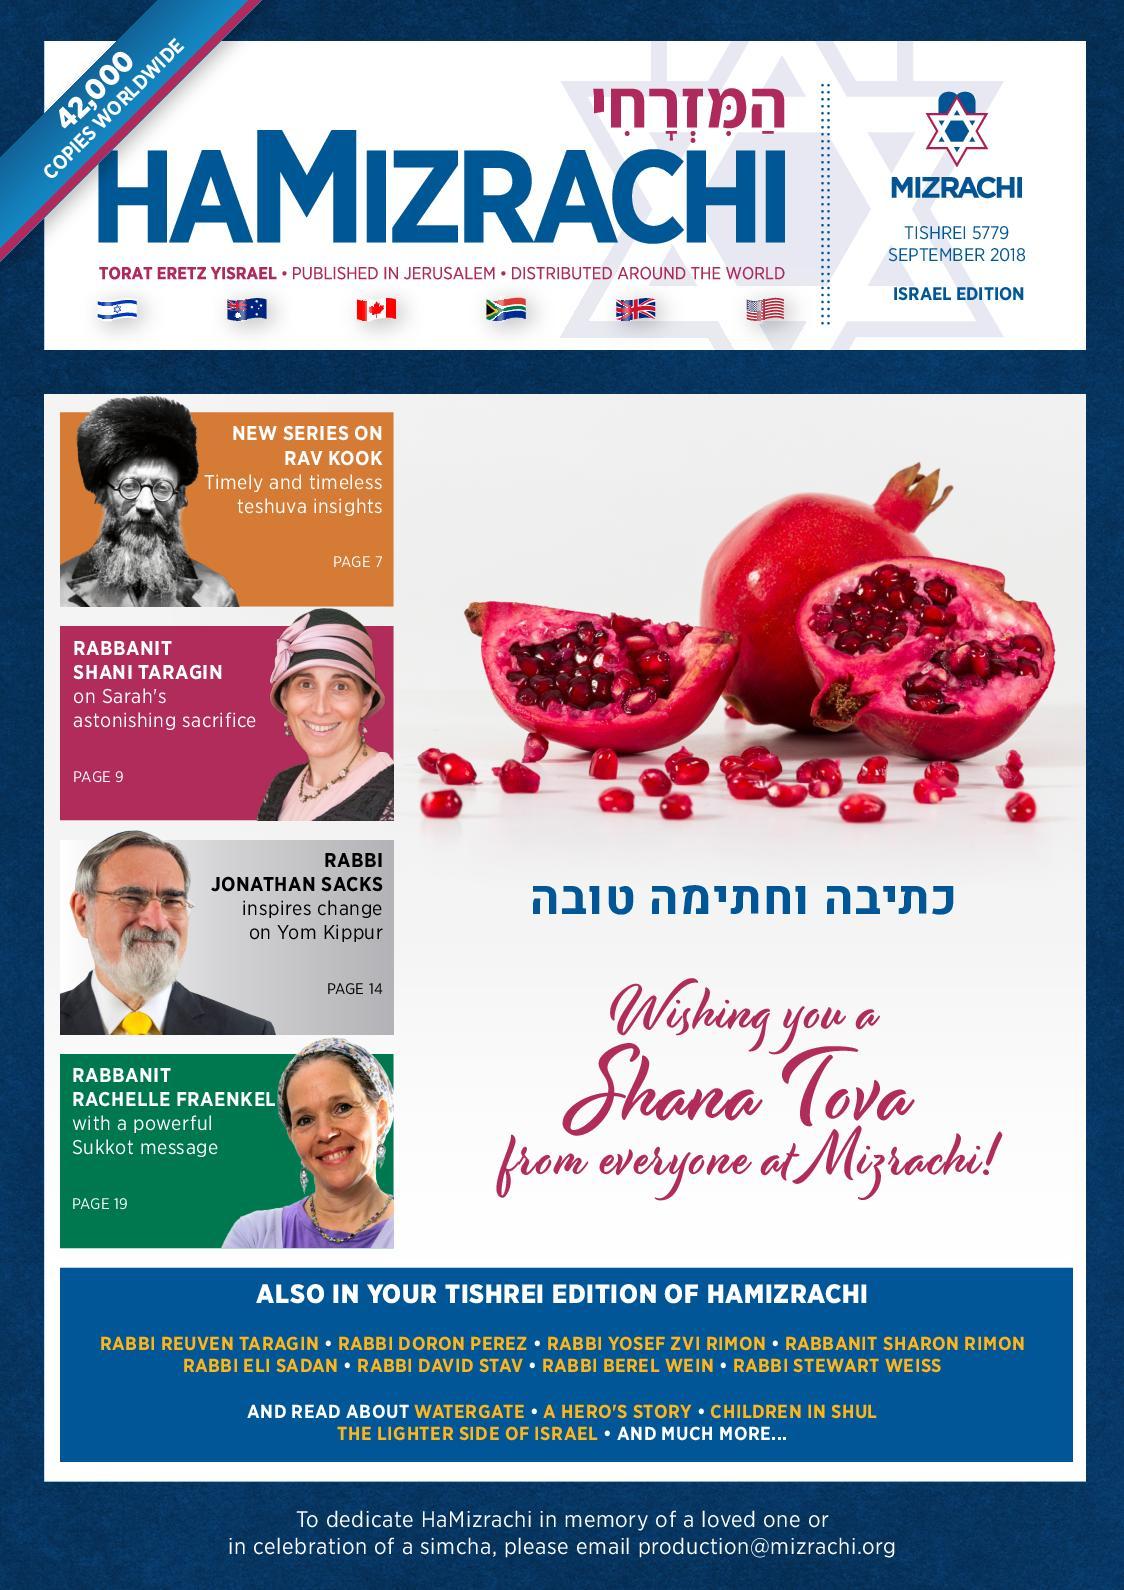 HaMizrachi Tishrei 5779